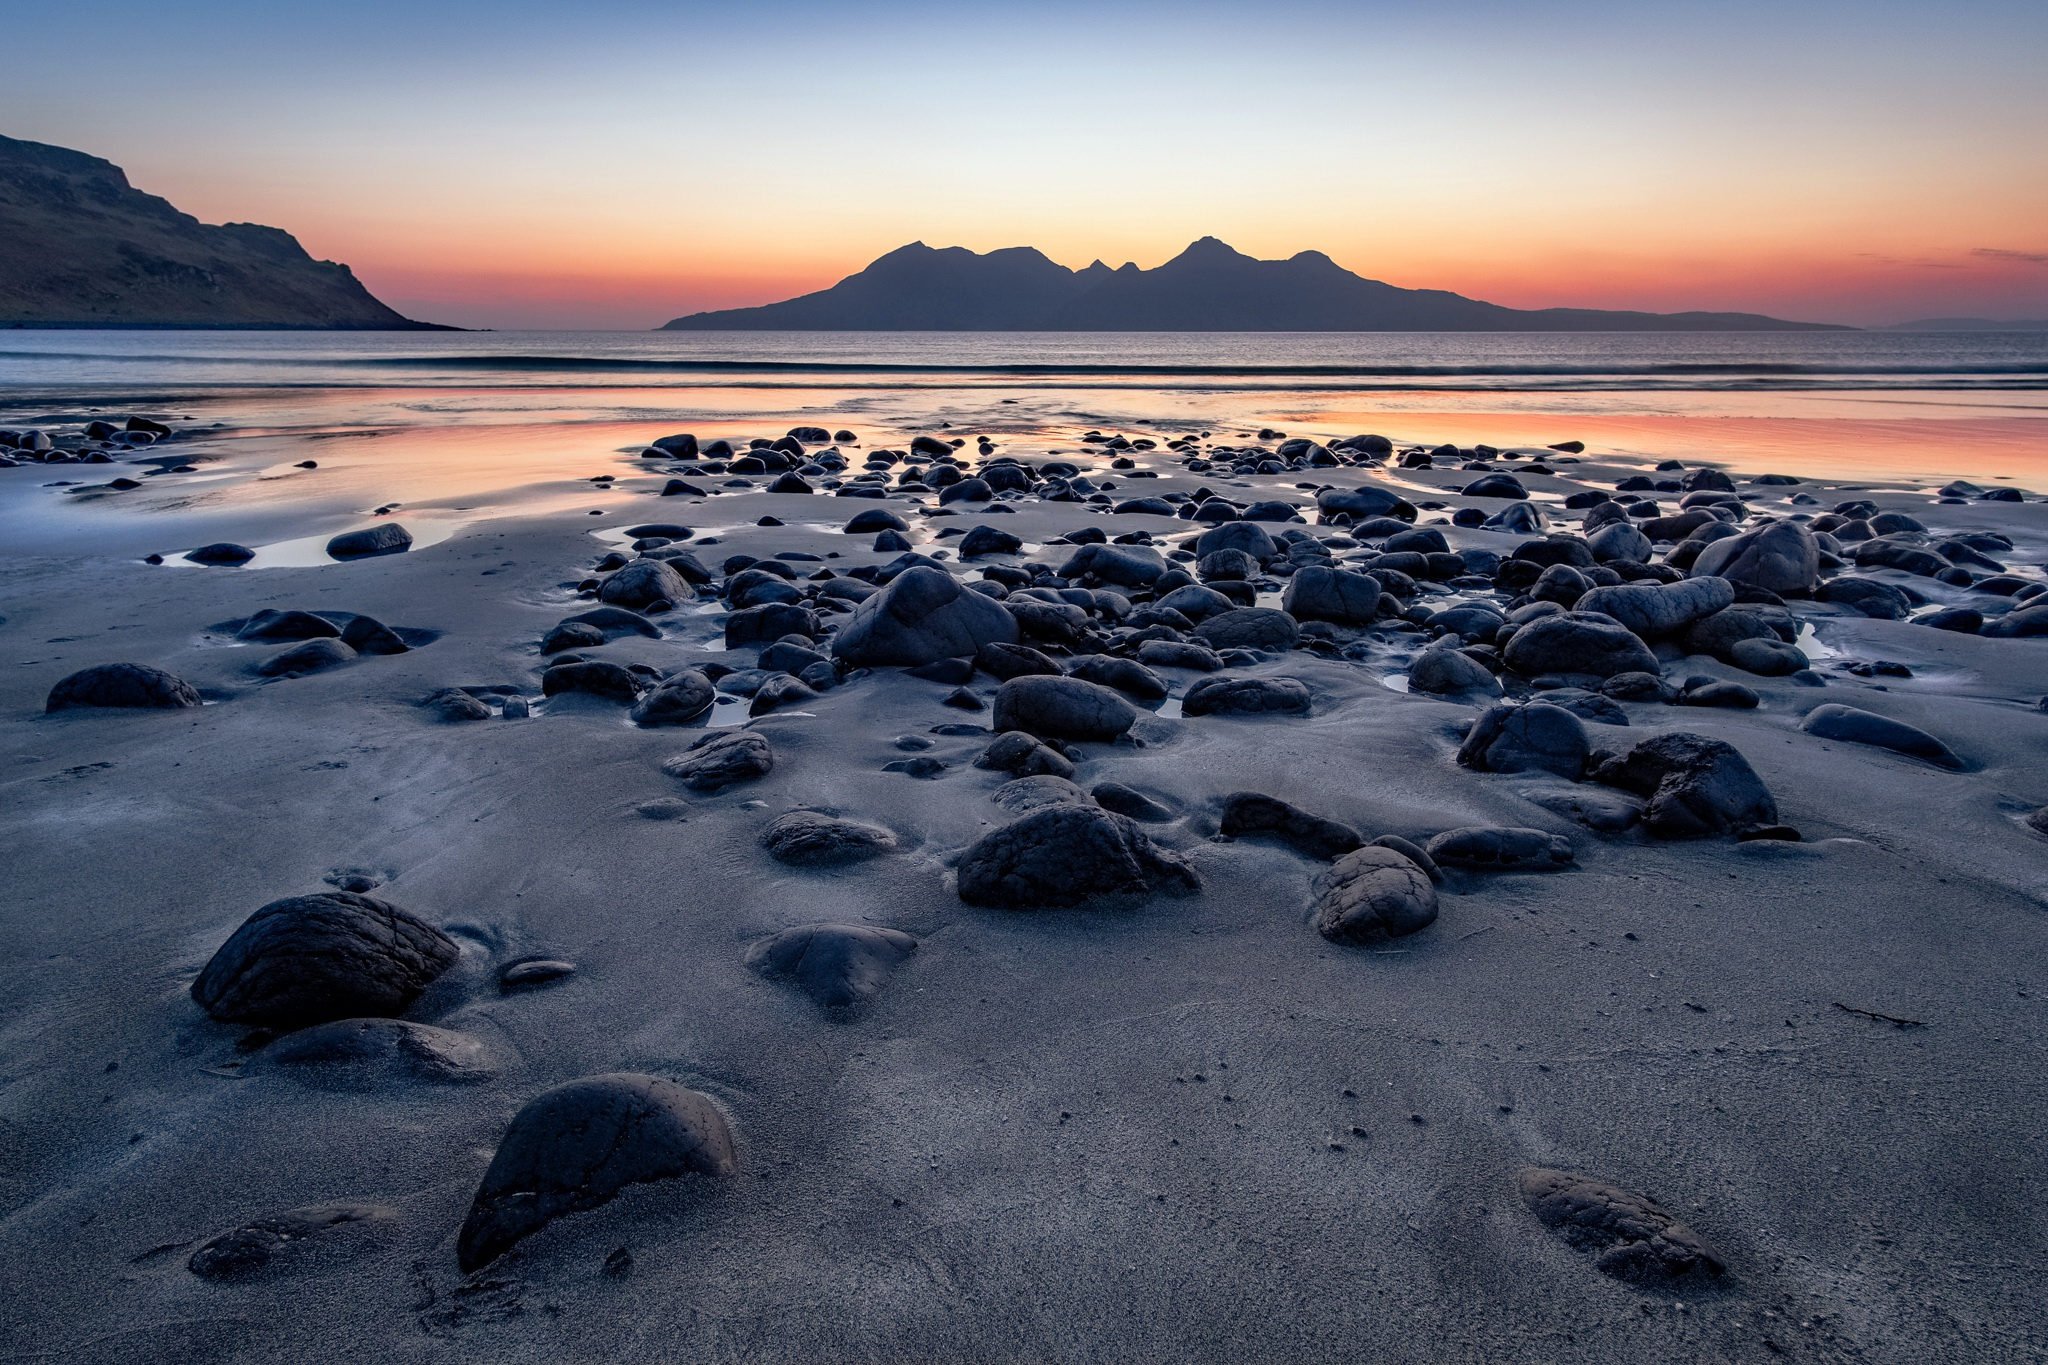 закат камень берег море sunset stone shore sea  № 1023665  скачать